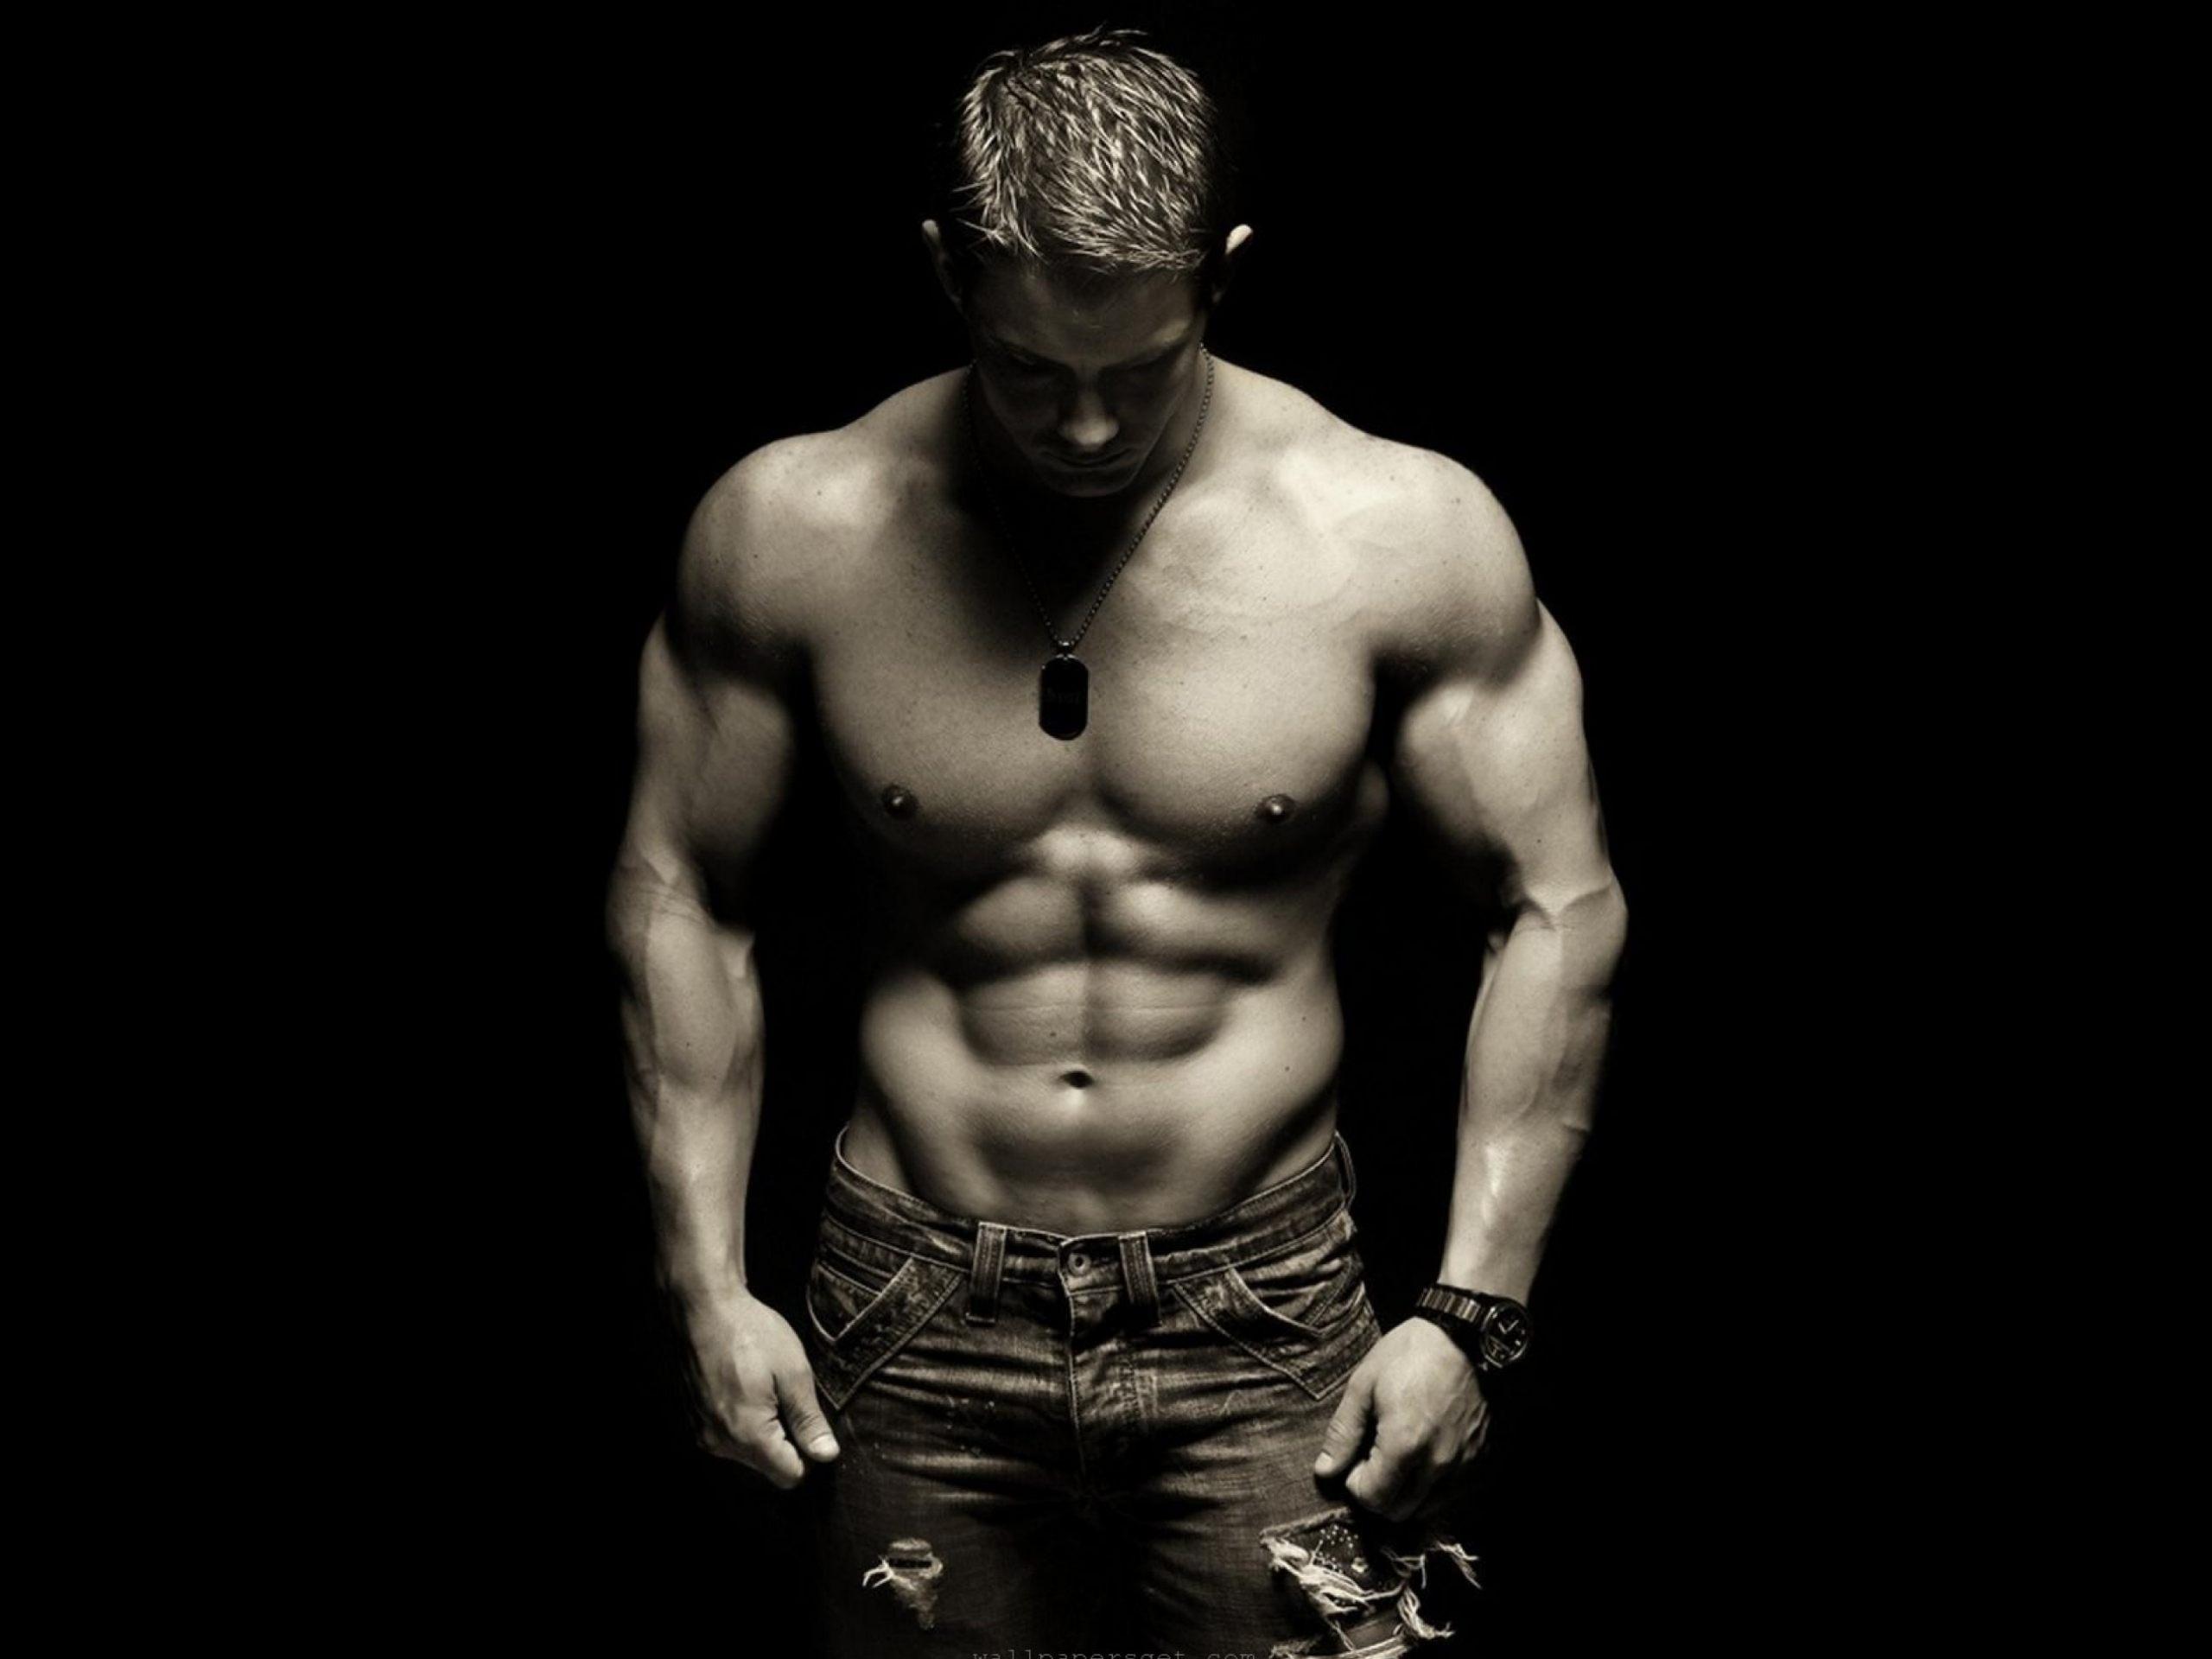 Топ-7 самых мускулистых мужчин мира